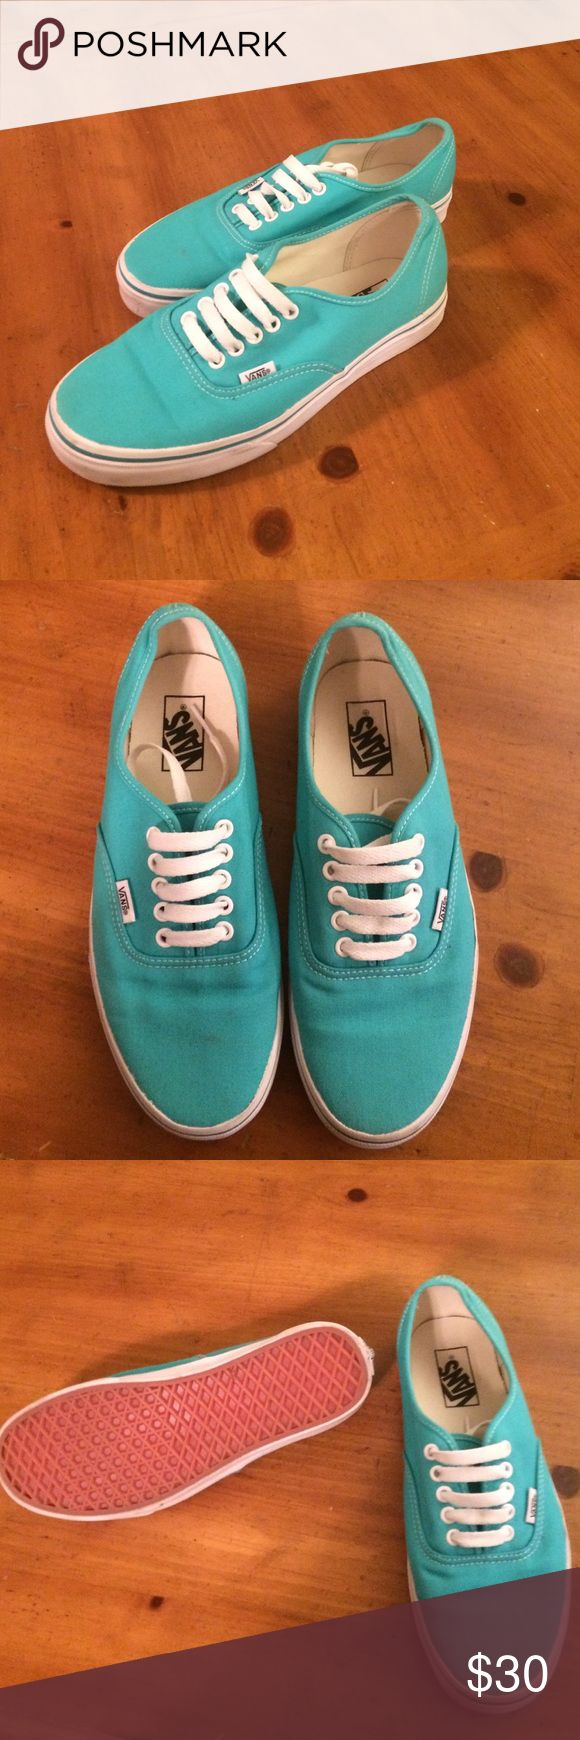 🎀SUPER CUTE AUTHENTIC TEAL VANS🎀 🎀🎀SUPER CUTE AND STYLISH AUTHENTIC TEAL VANS🎀🎀 WORN TWICE!🎀🎀 MENS 8 WOMENS 9.5🎀🎀 Vans Shoes Sneakers